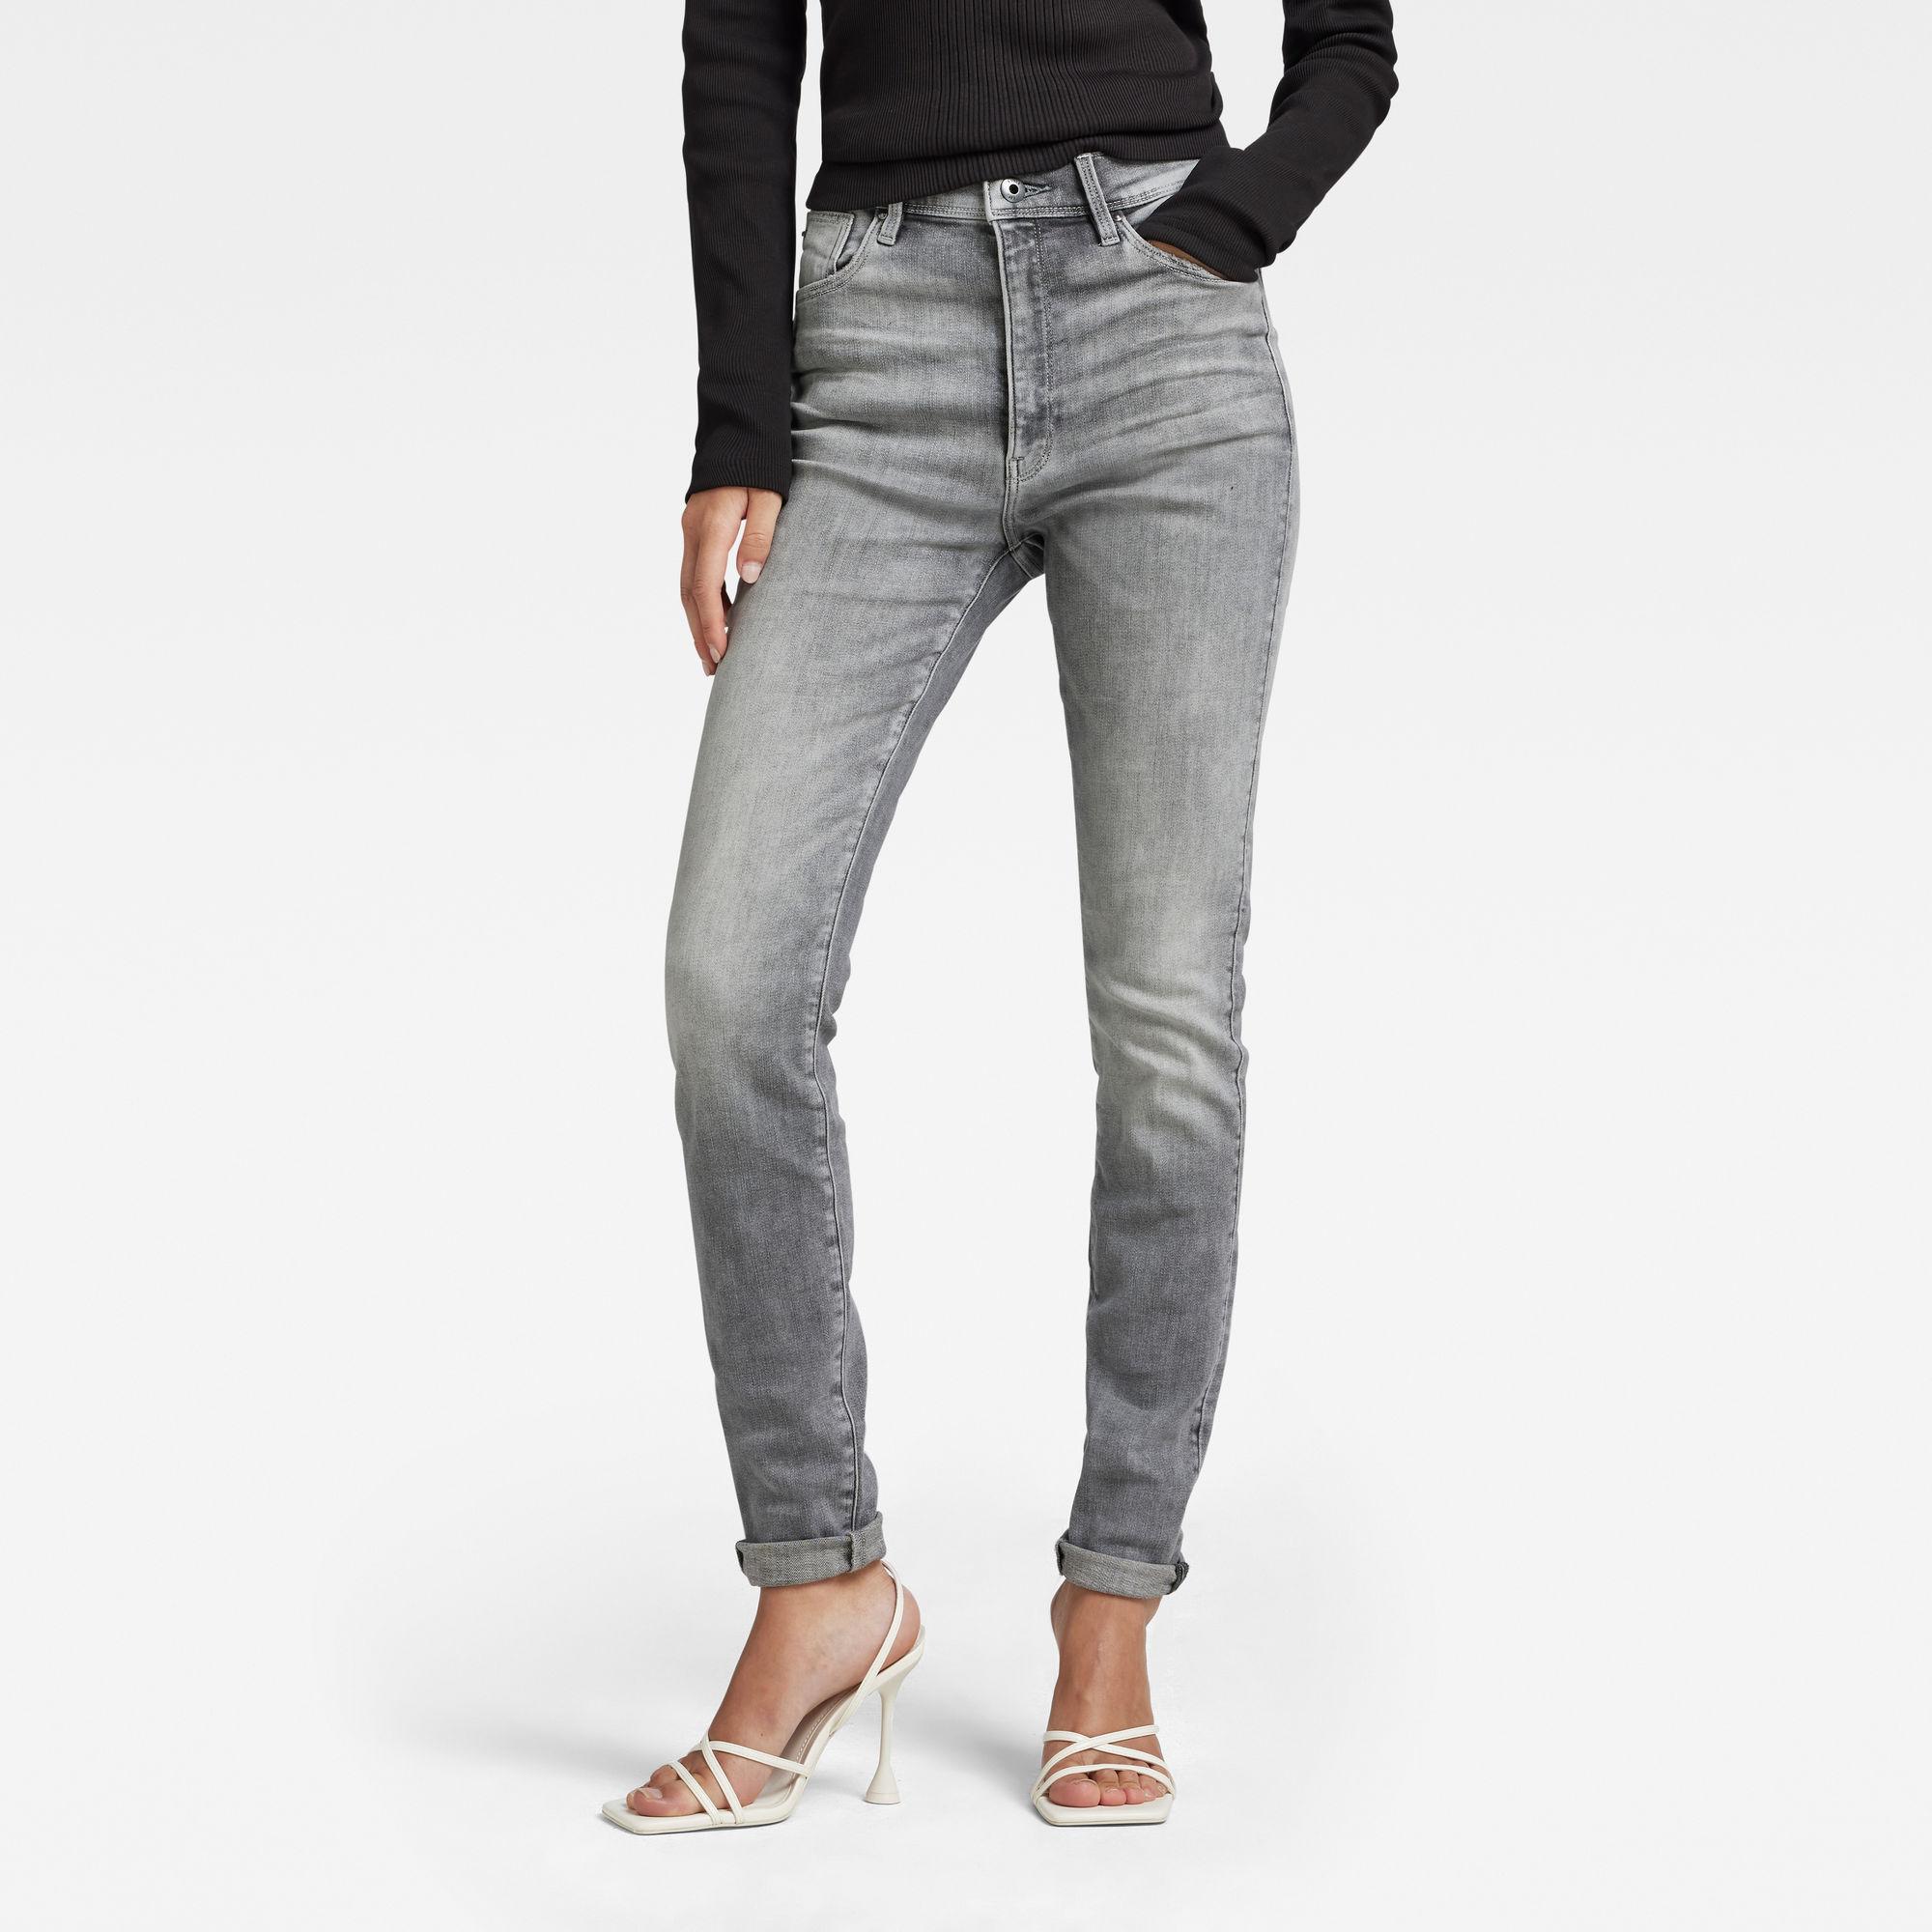 G-Star RAW Dames Kafey Ultra High Skinny Jeans Grijs